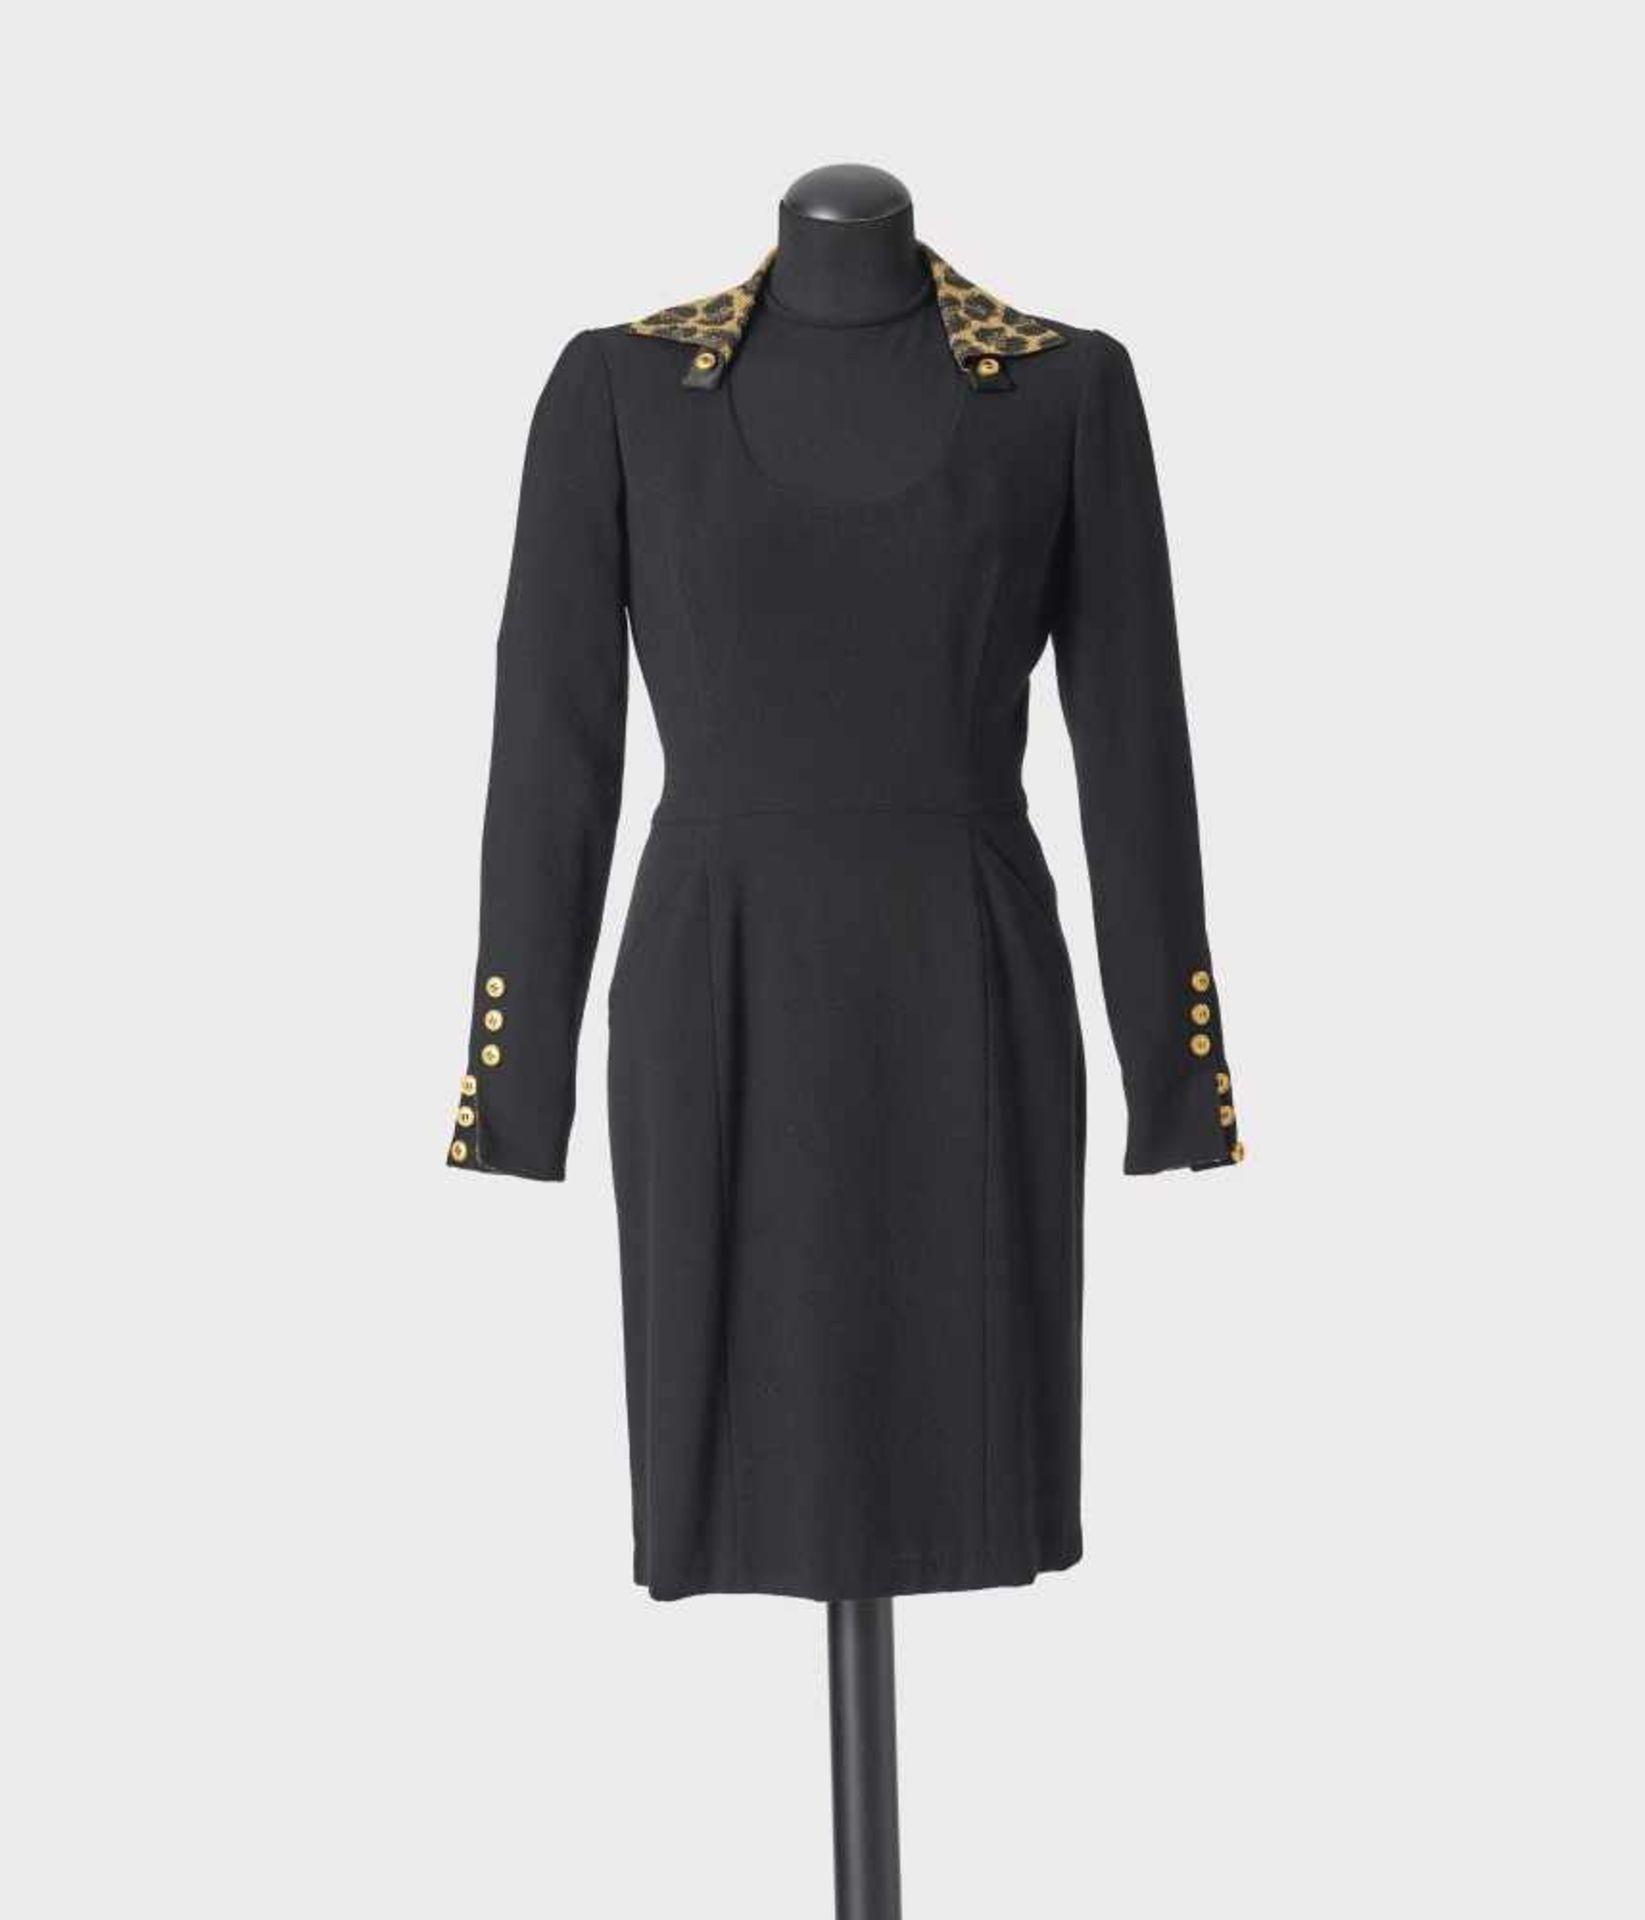 DressGianfranco Ferré for Christian Dior, Paris Ready-To-Wear Collection Dior Boutique c. 1992/